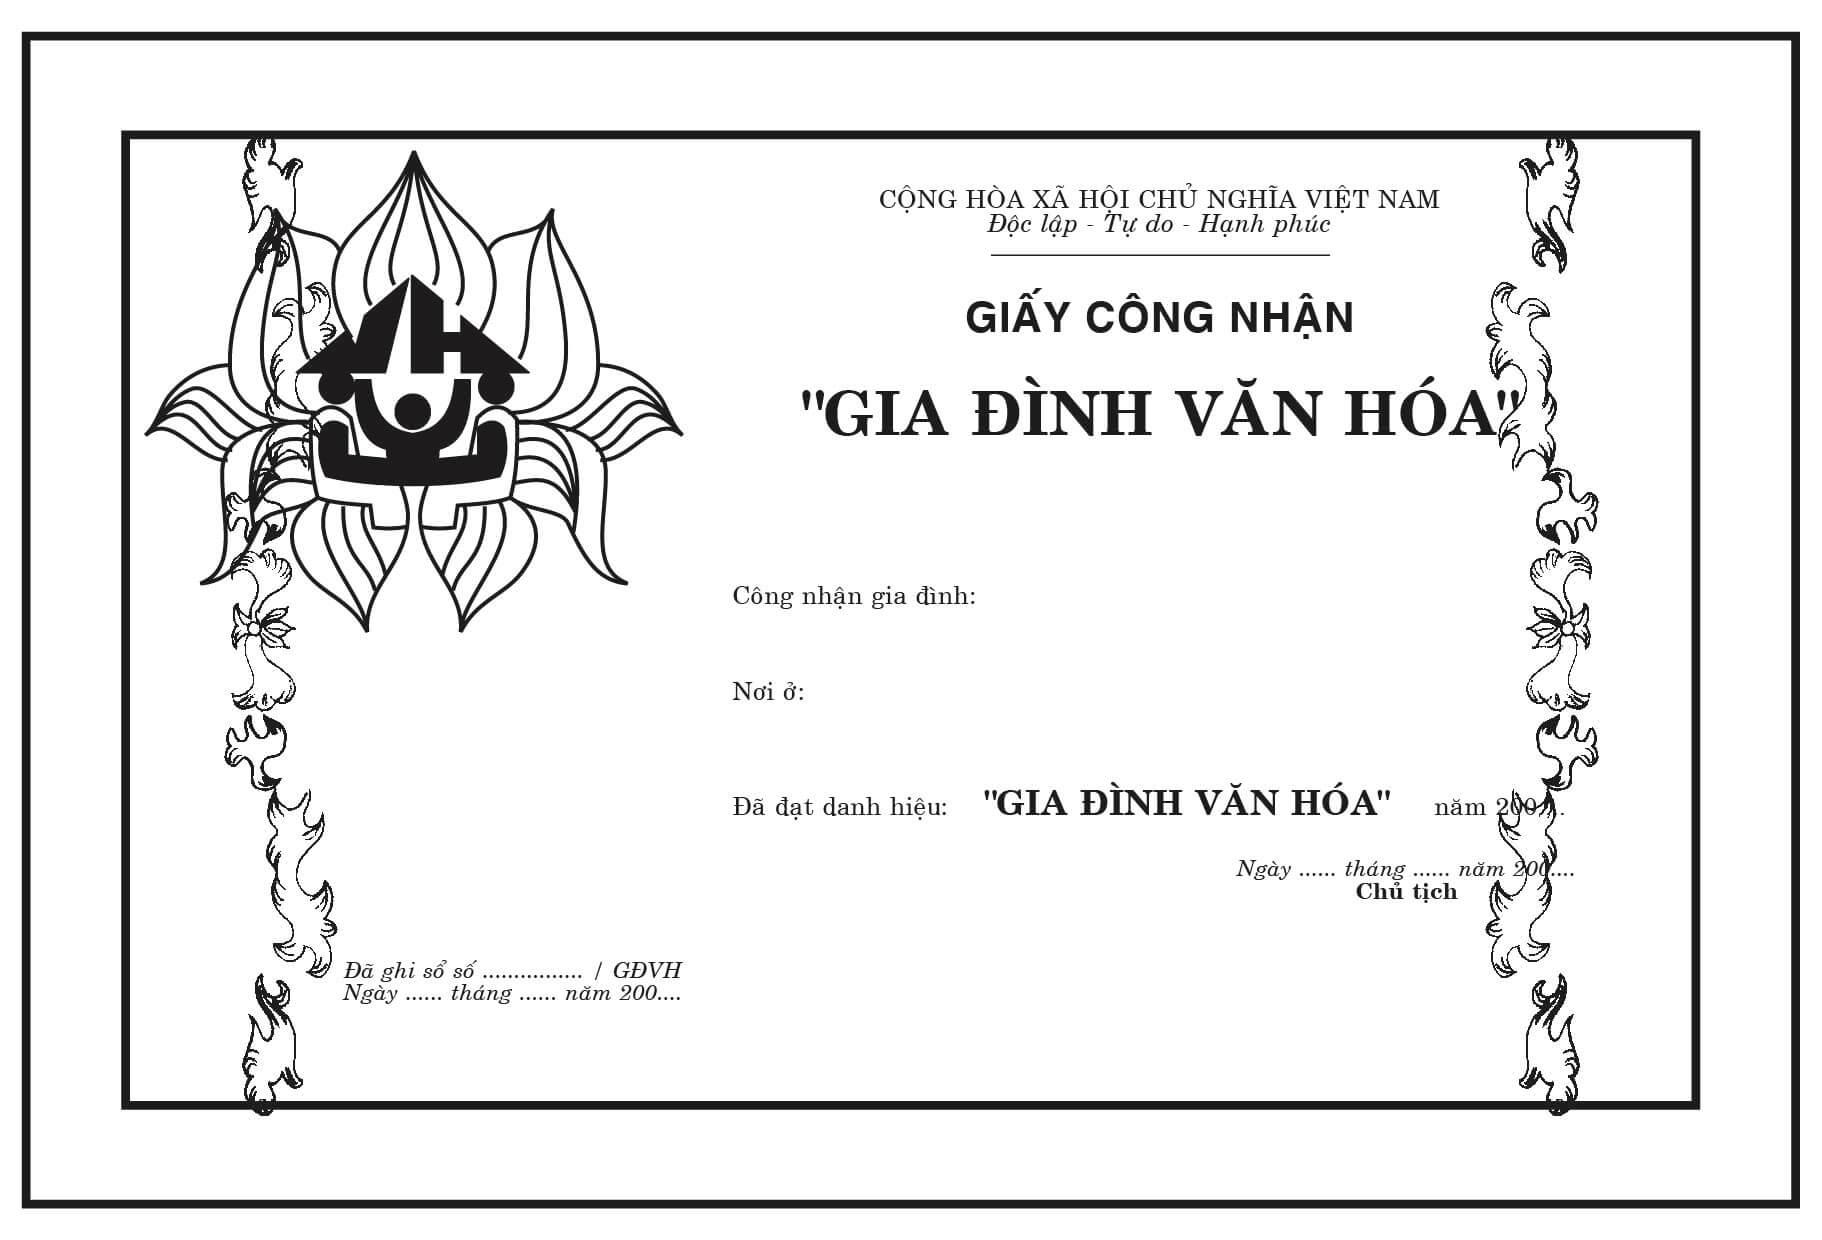 Mẫu giấy khen 027 - mẫu giấy khen gia đình văn hóa - Link Download : https://adsnew.net/tAzat